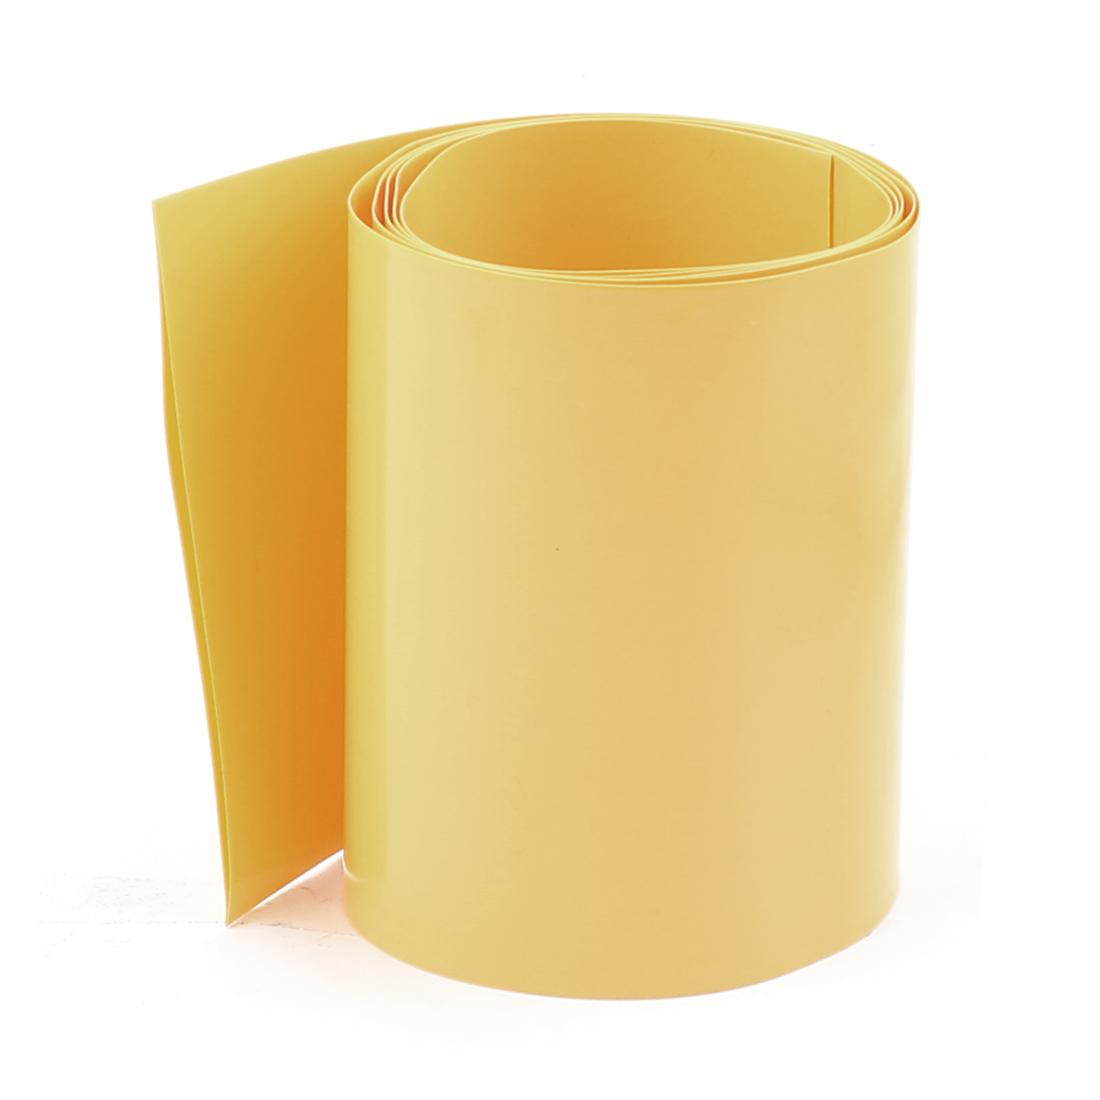 3.3ft 85mm Flat 54mm Dia PVC Heat Shrink Tubing Yellow for 4 x 18650 Battery